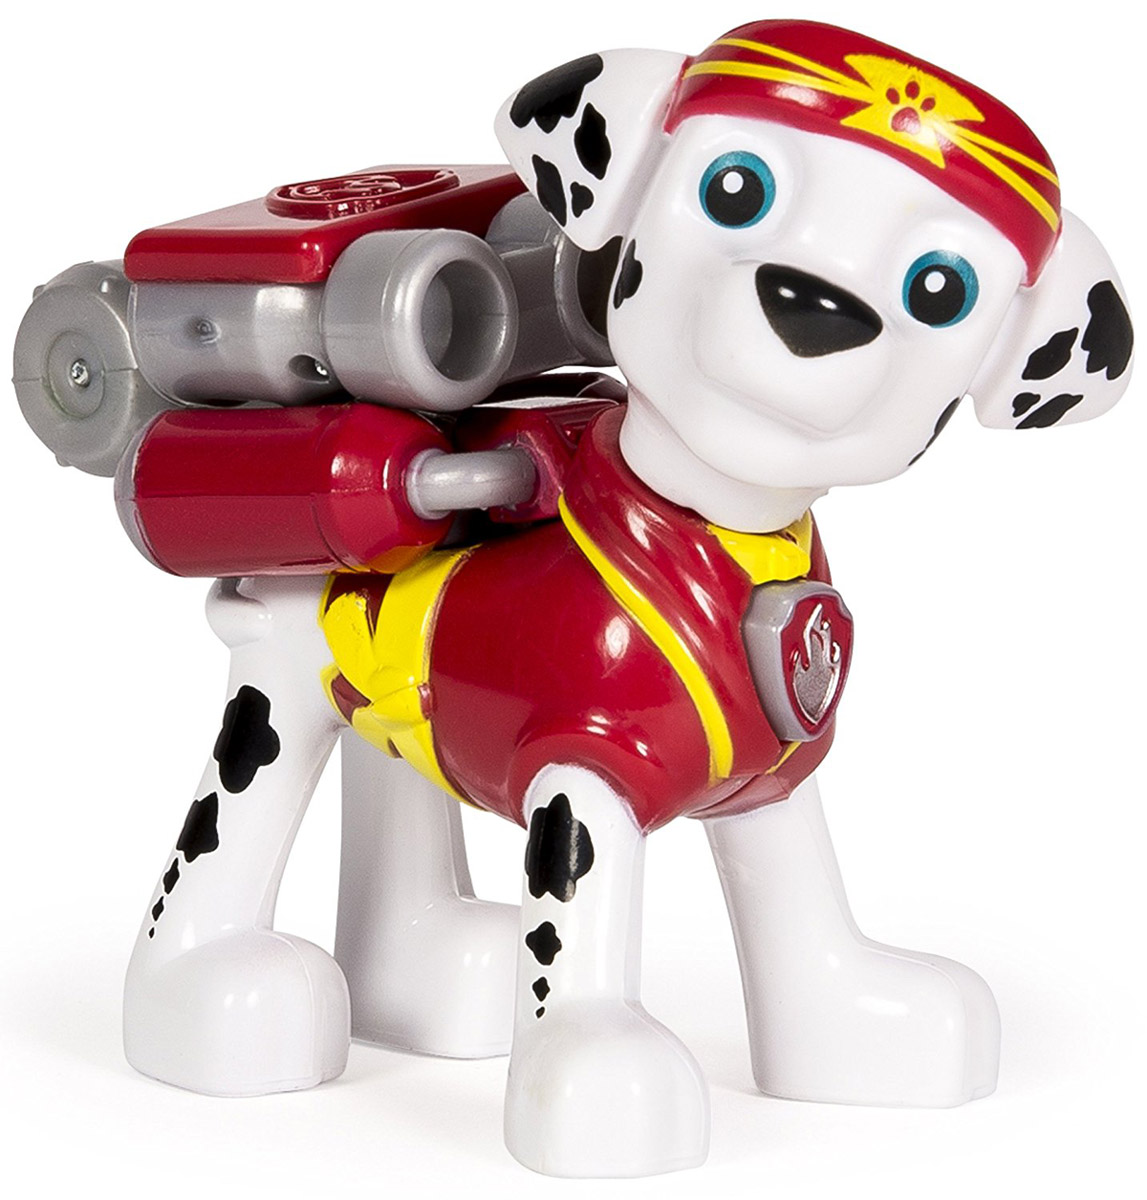 Paw Patrol Фигурка Pup-Fu Marshall paw patrol фигурка marshall 16612 20078994